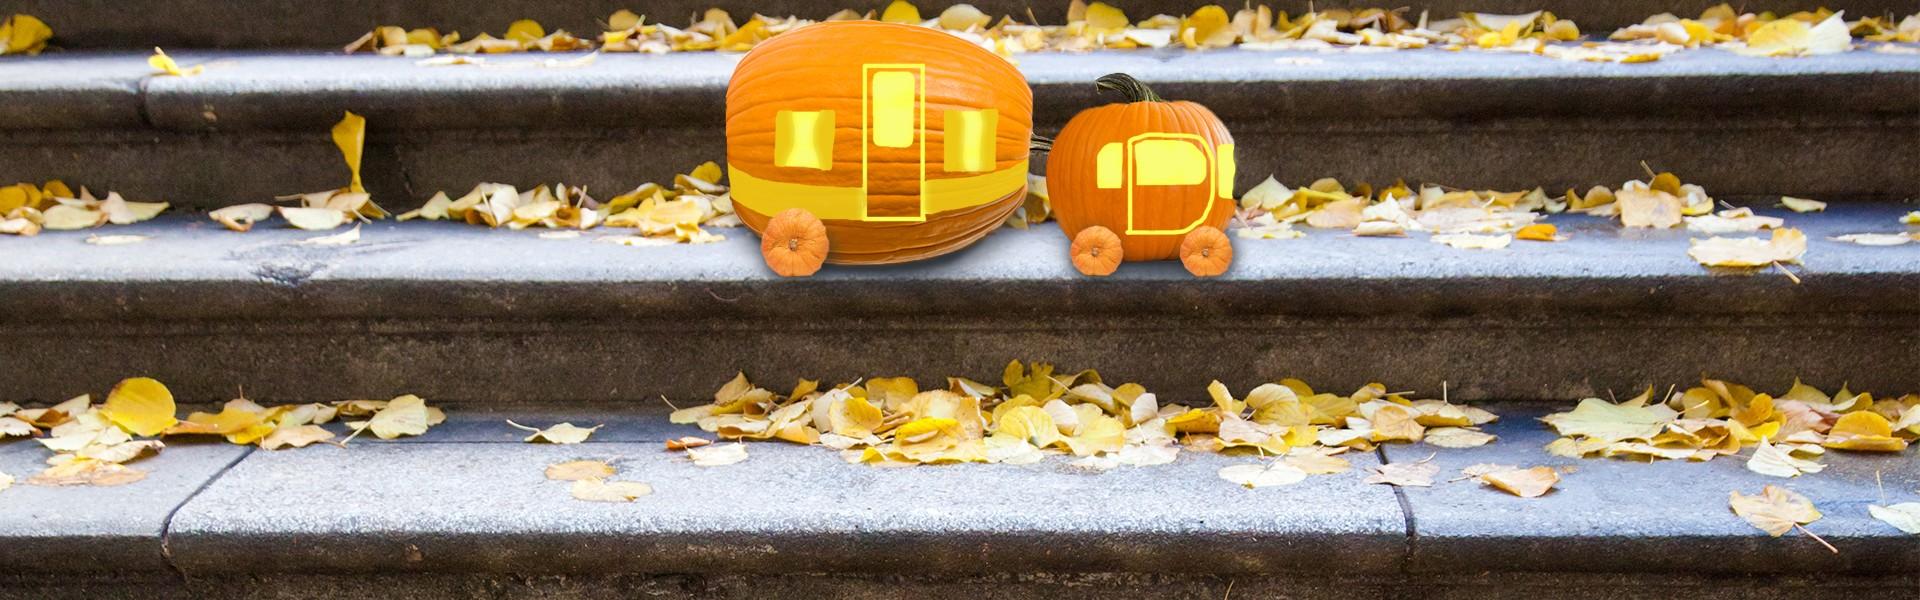 rv pumpkin carving